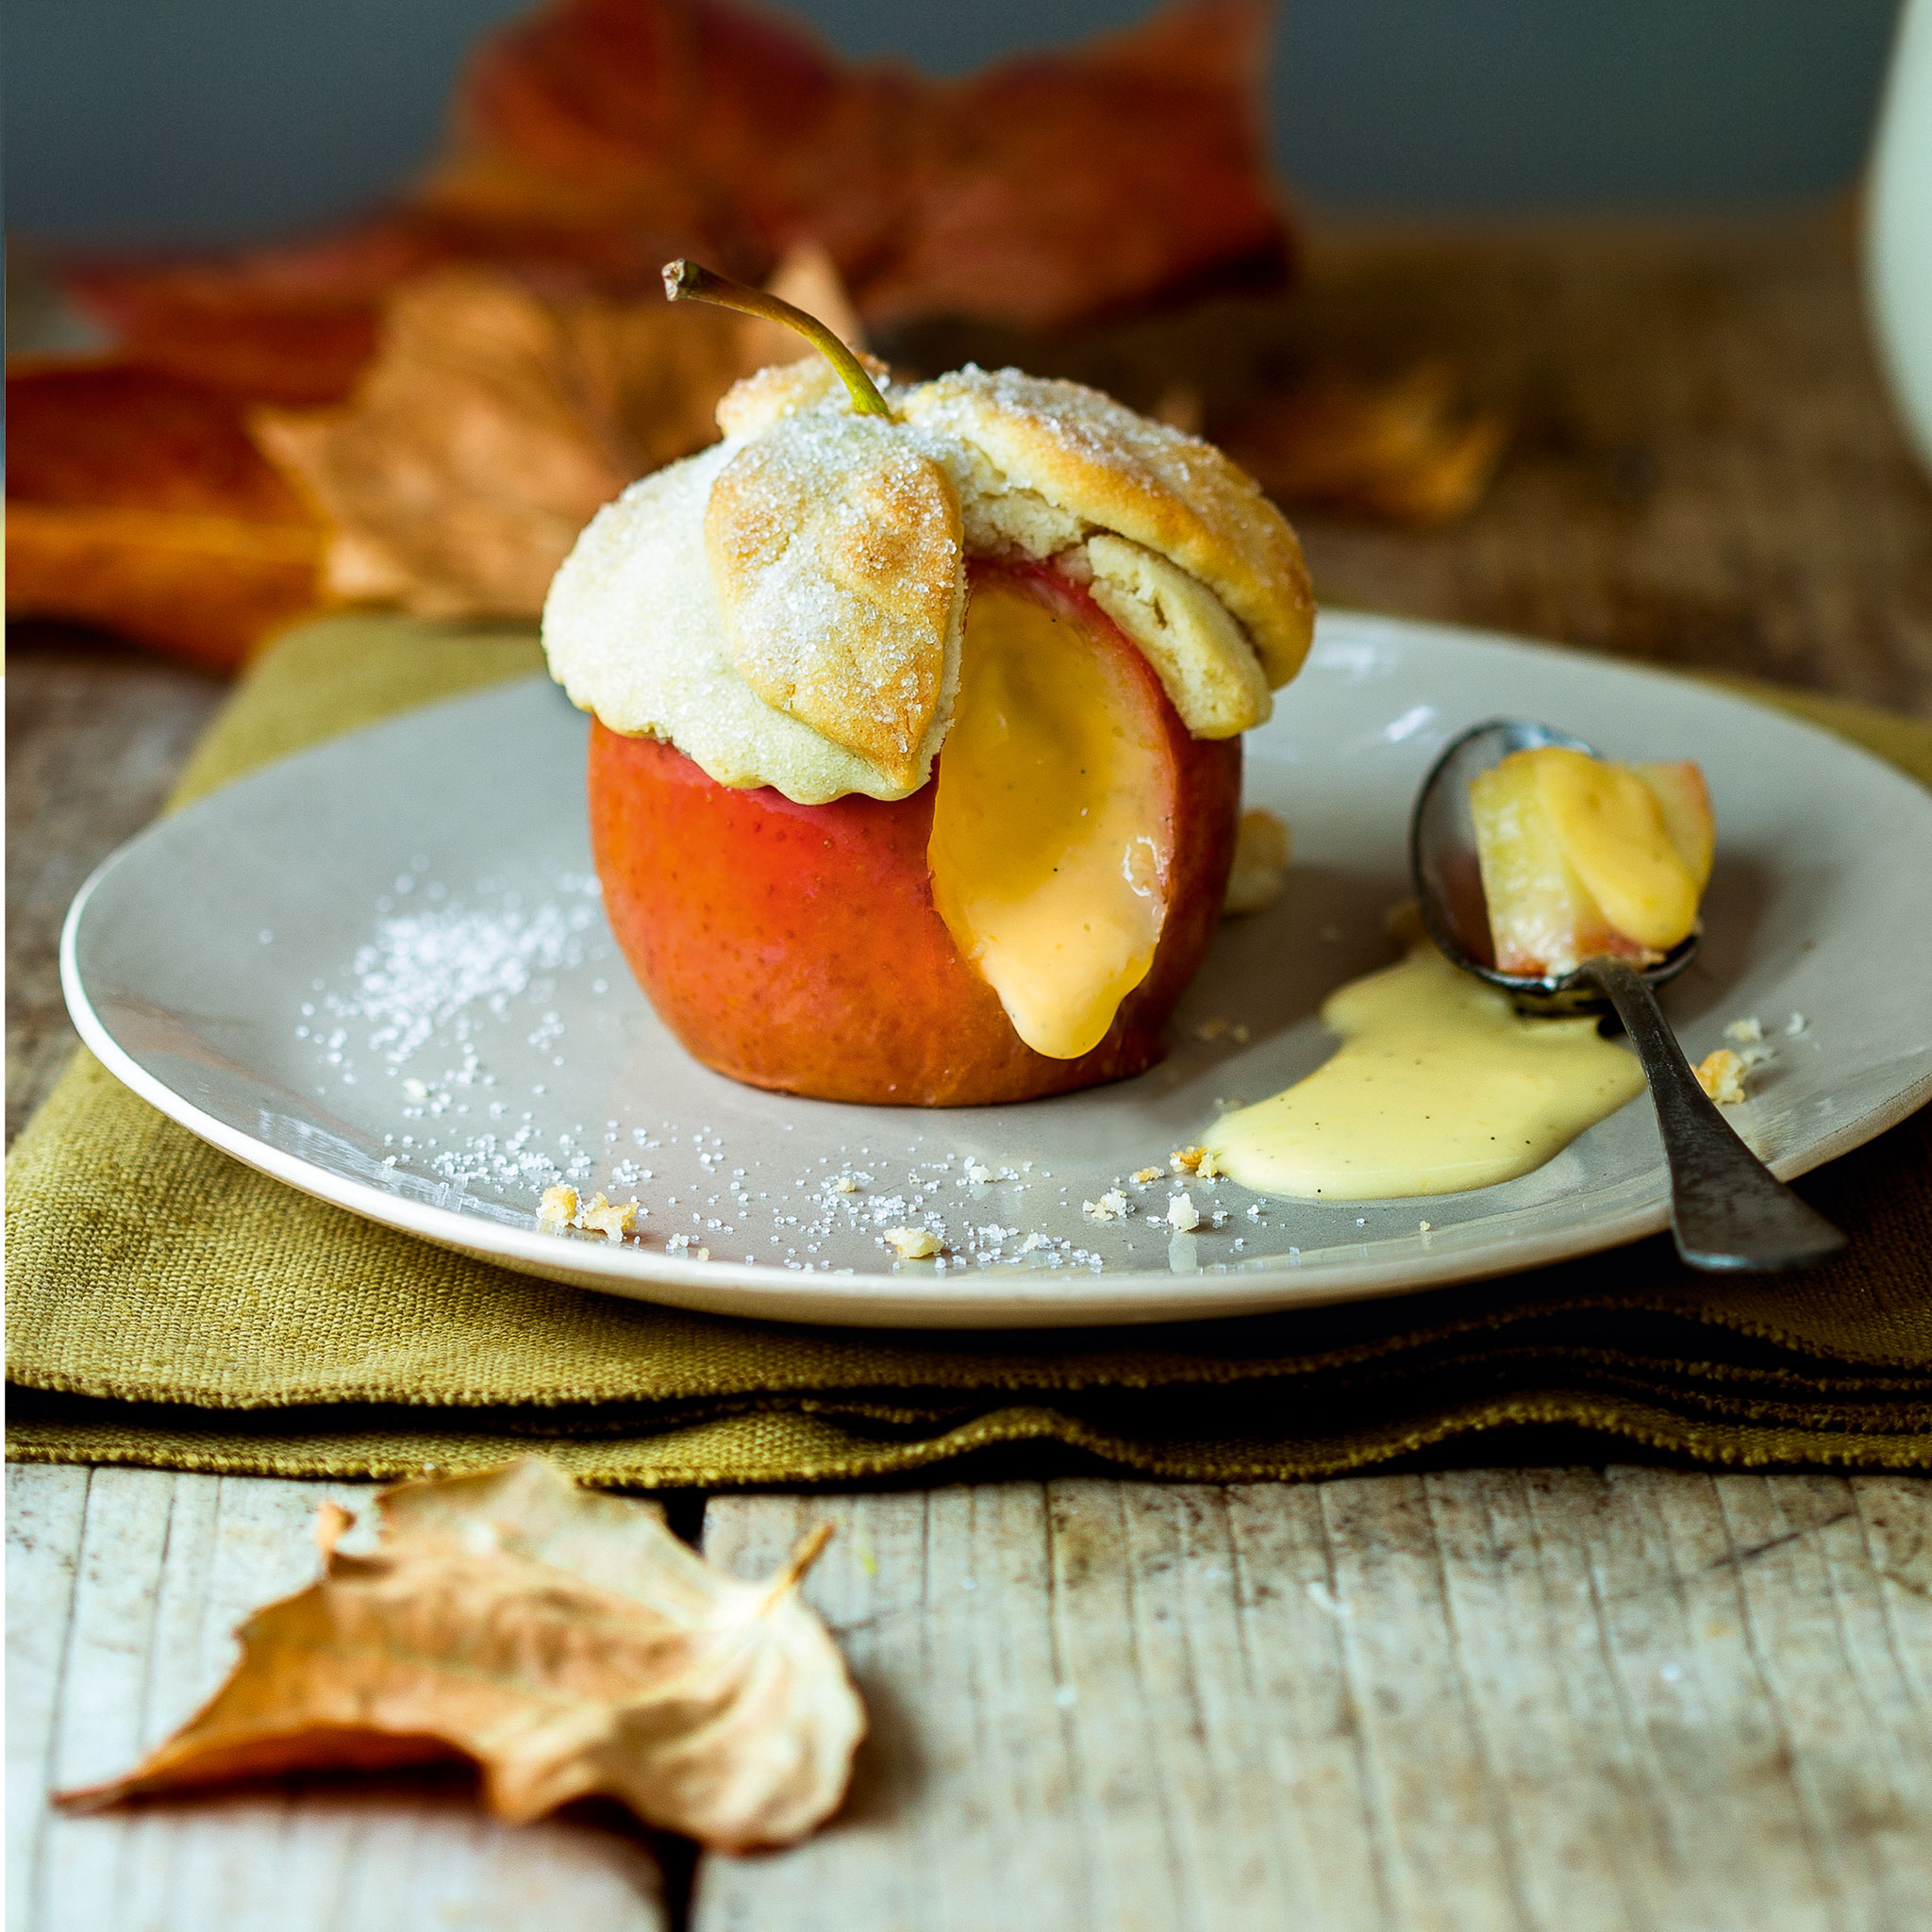 Baked apple and custard pies